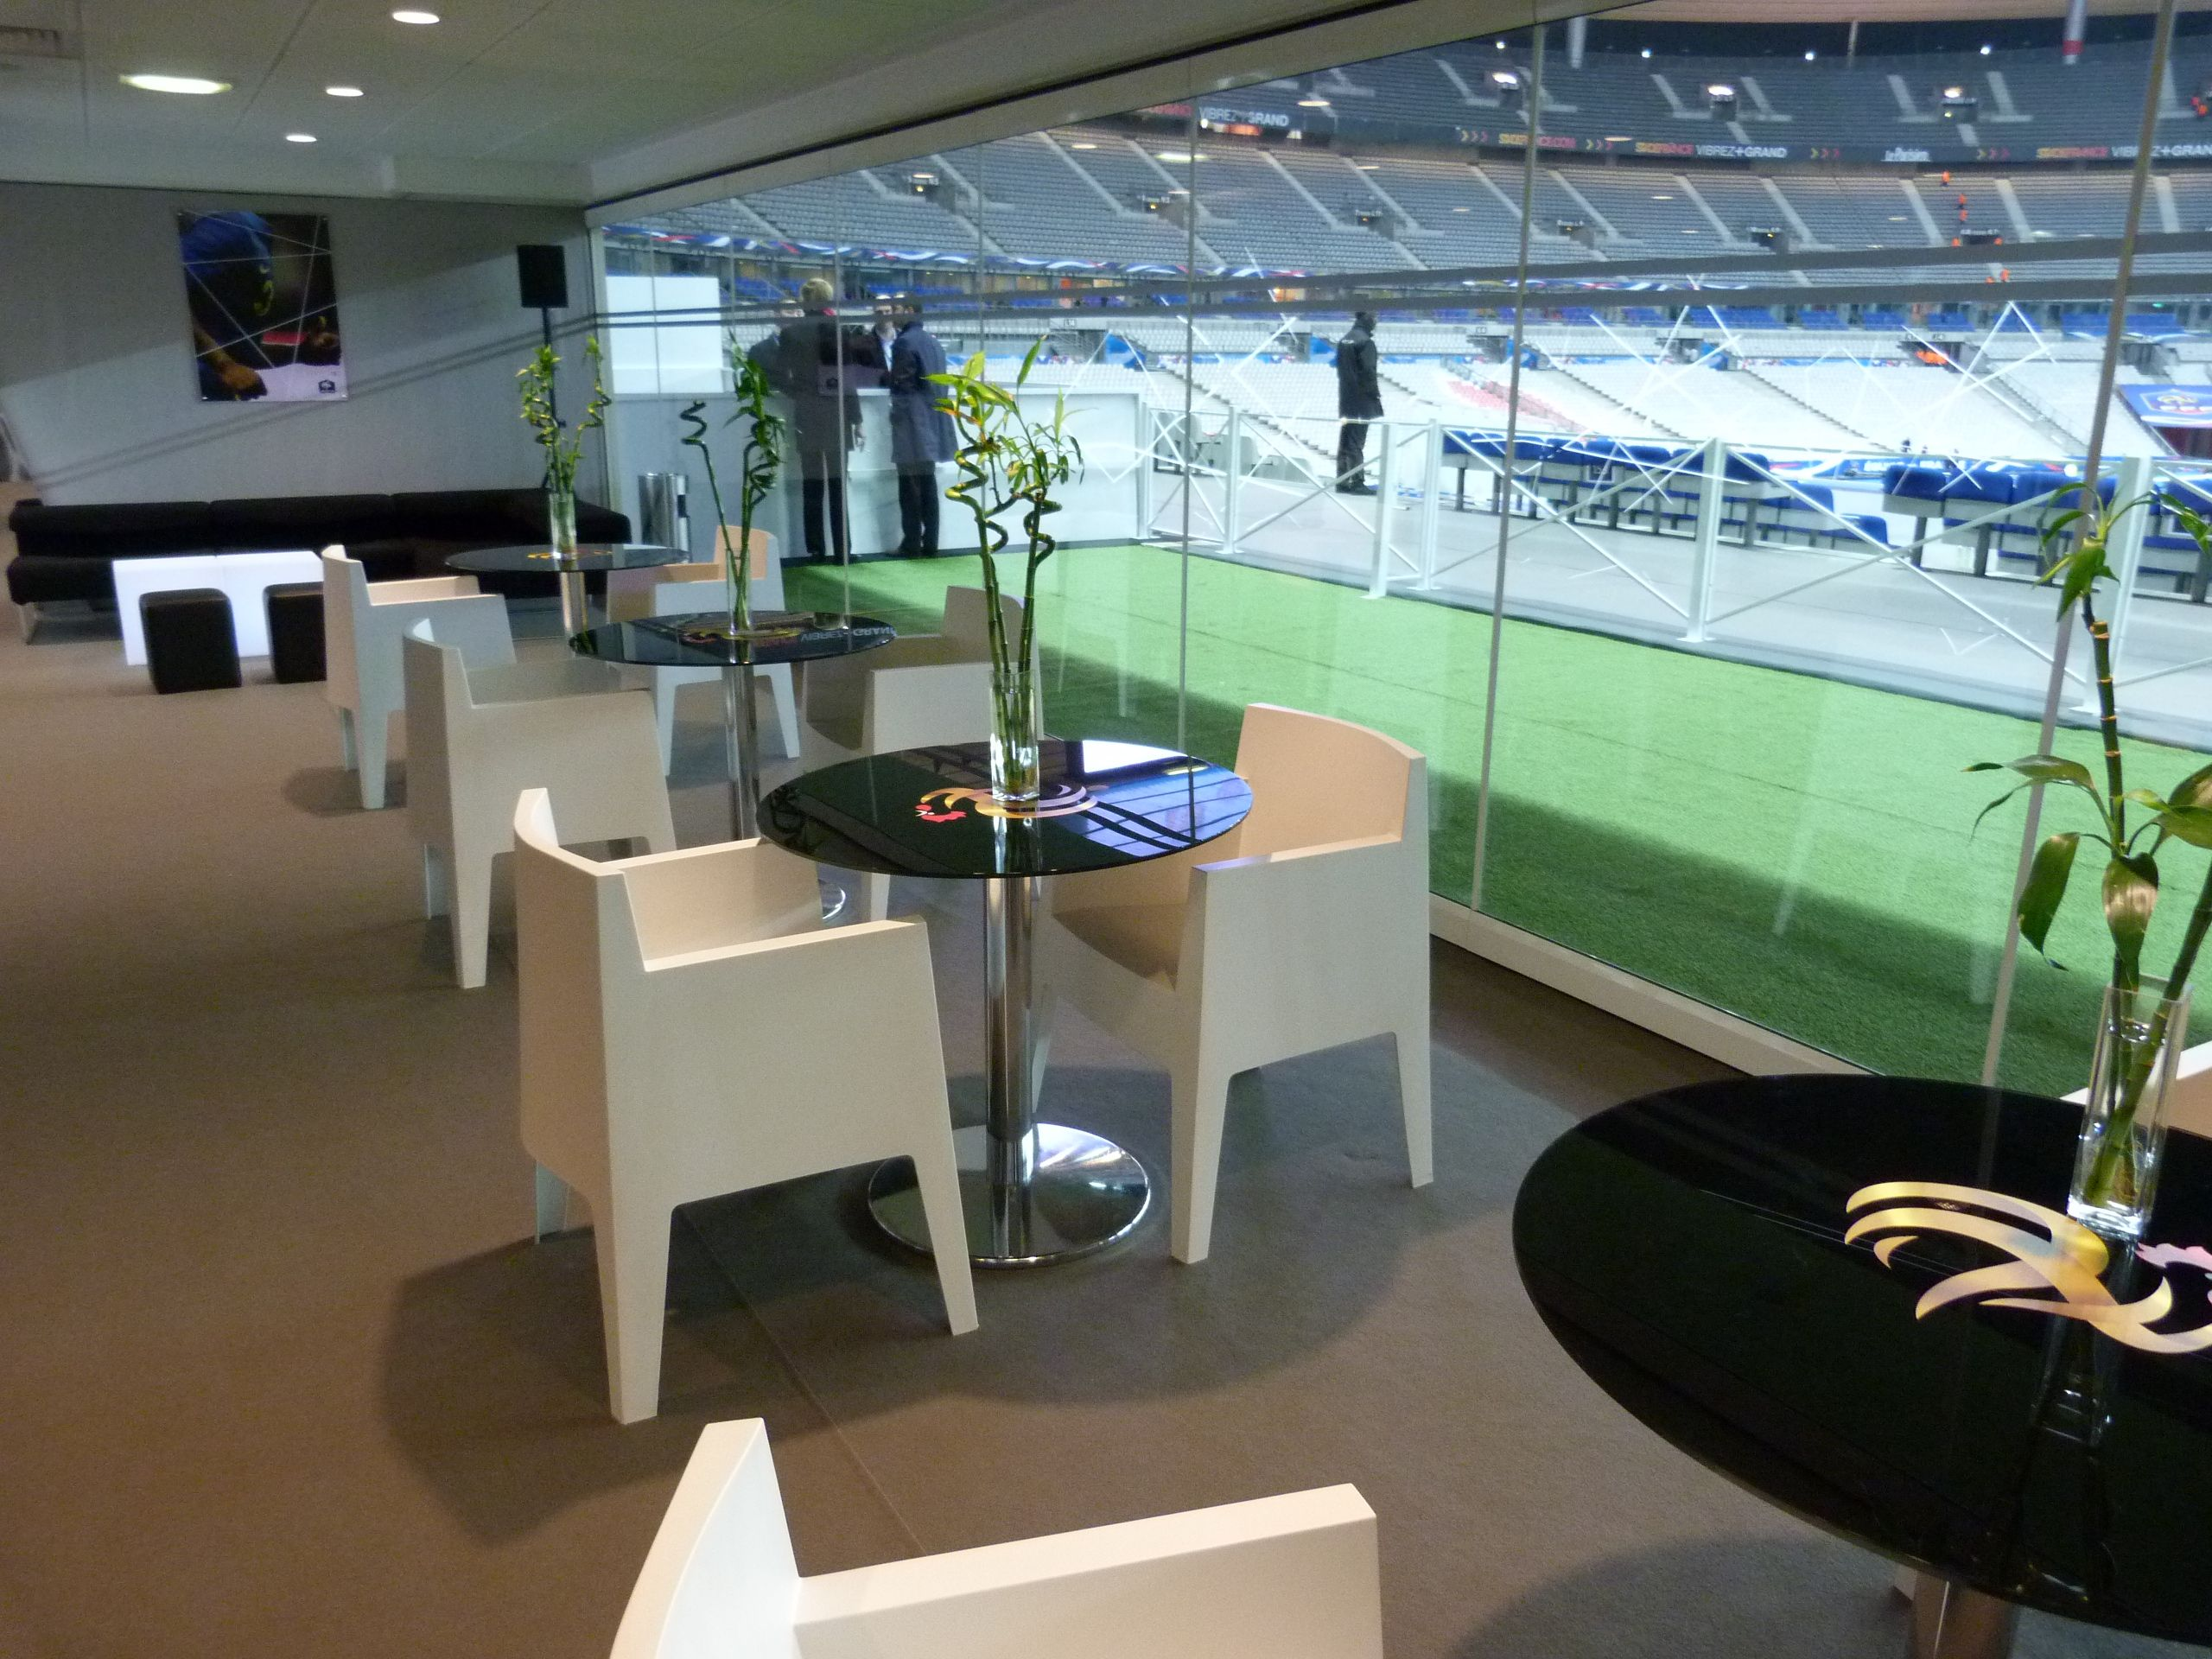 Salon Club FFF - Match EDFA saisons 2012/2013 et 2013/2014 - Stade de France